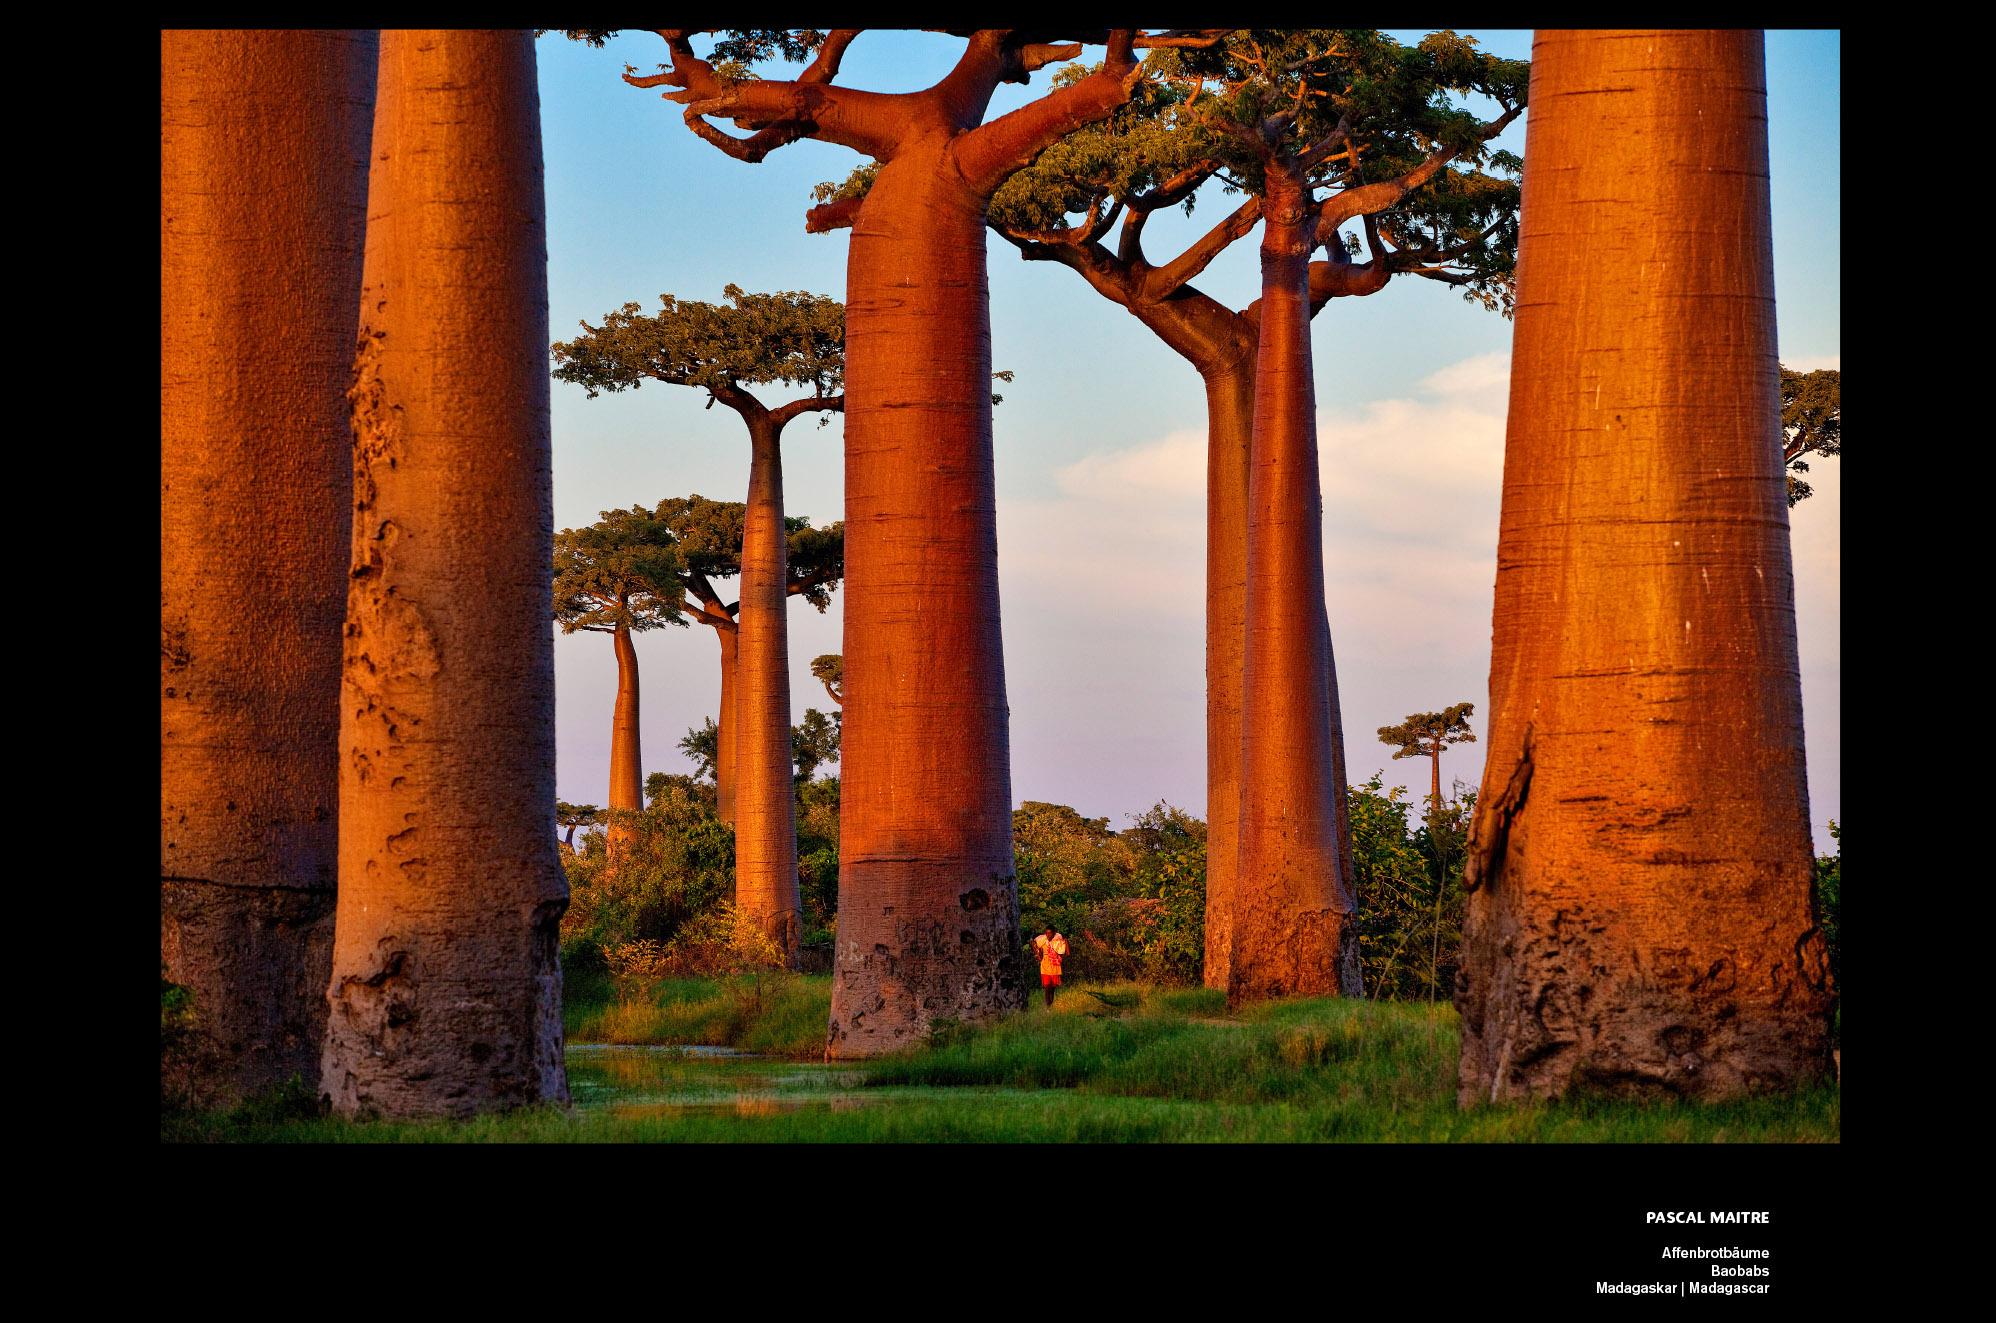 Bäume neu Maitre 24_trees_14_1690x1120_1x_dibond_print_cewe_srgb